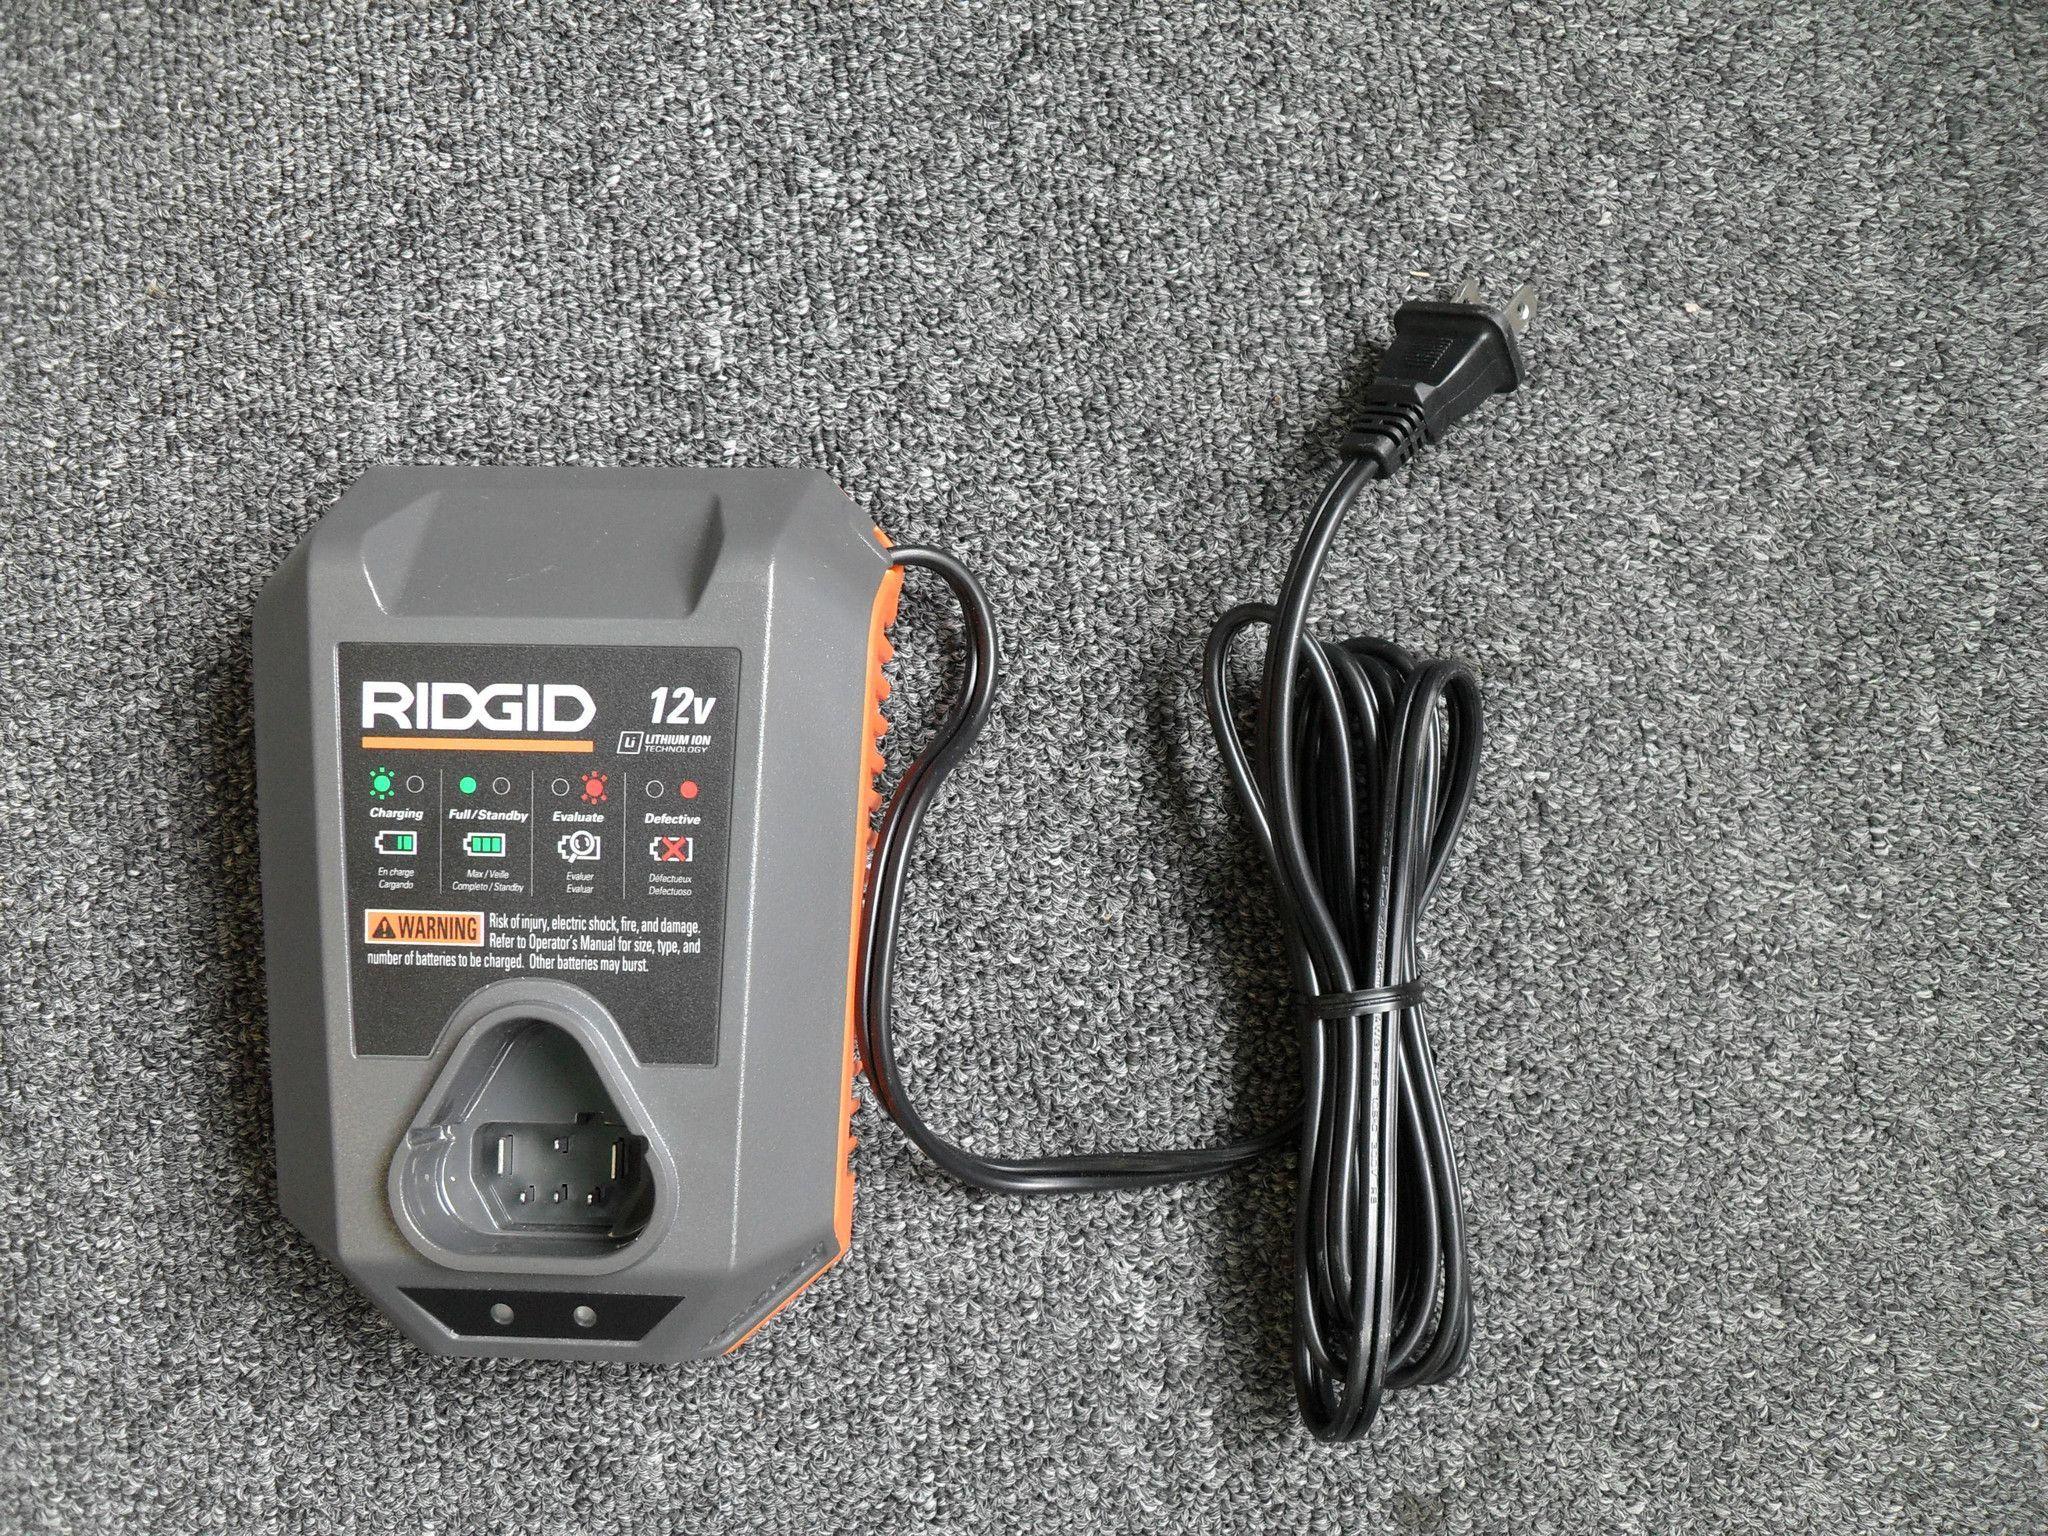 ridgid v battery schematic diagram on rothenberger 12v battery bosch 12v battery ridgid radio  [ 2048 x 1536 Pixel ]